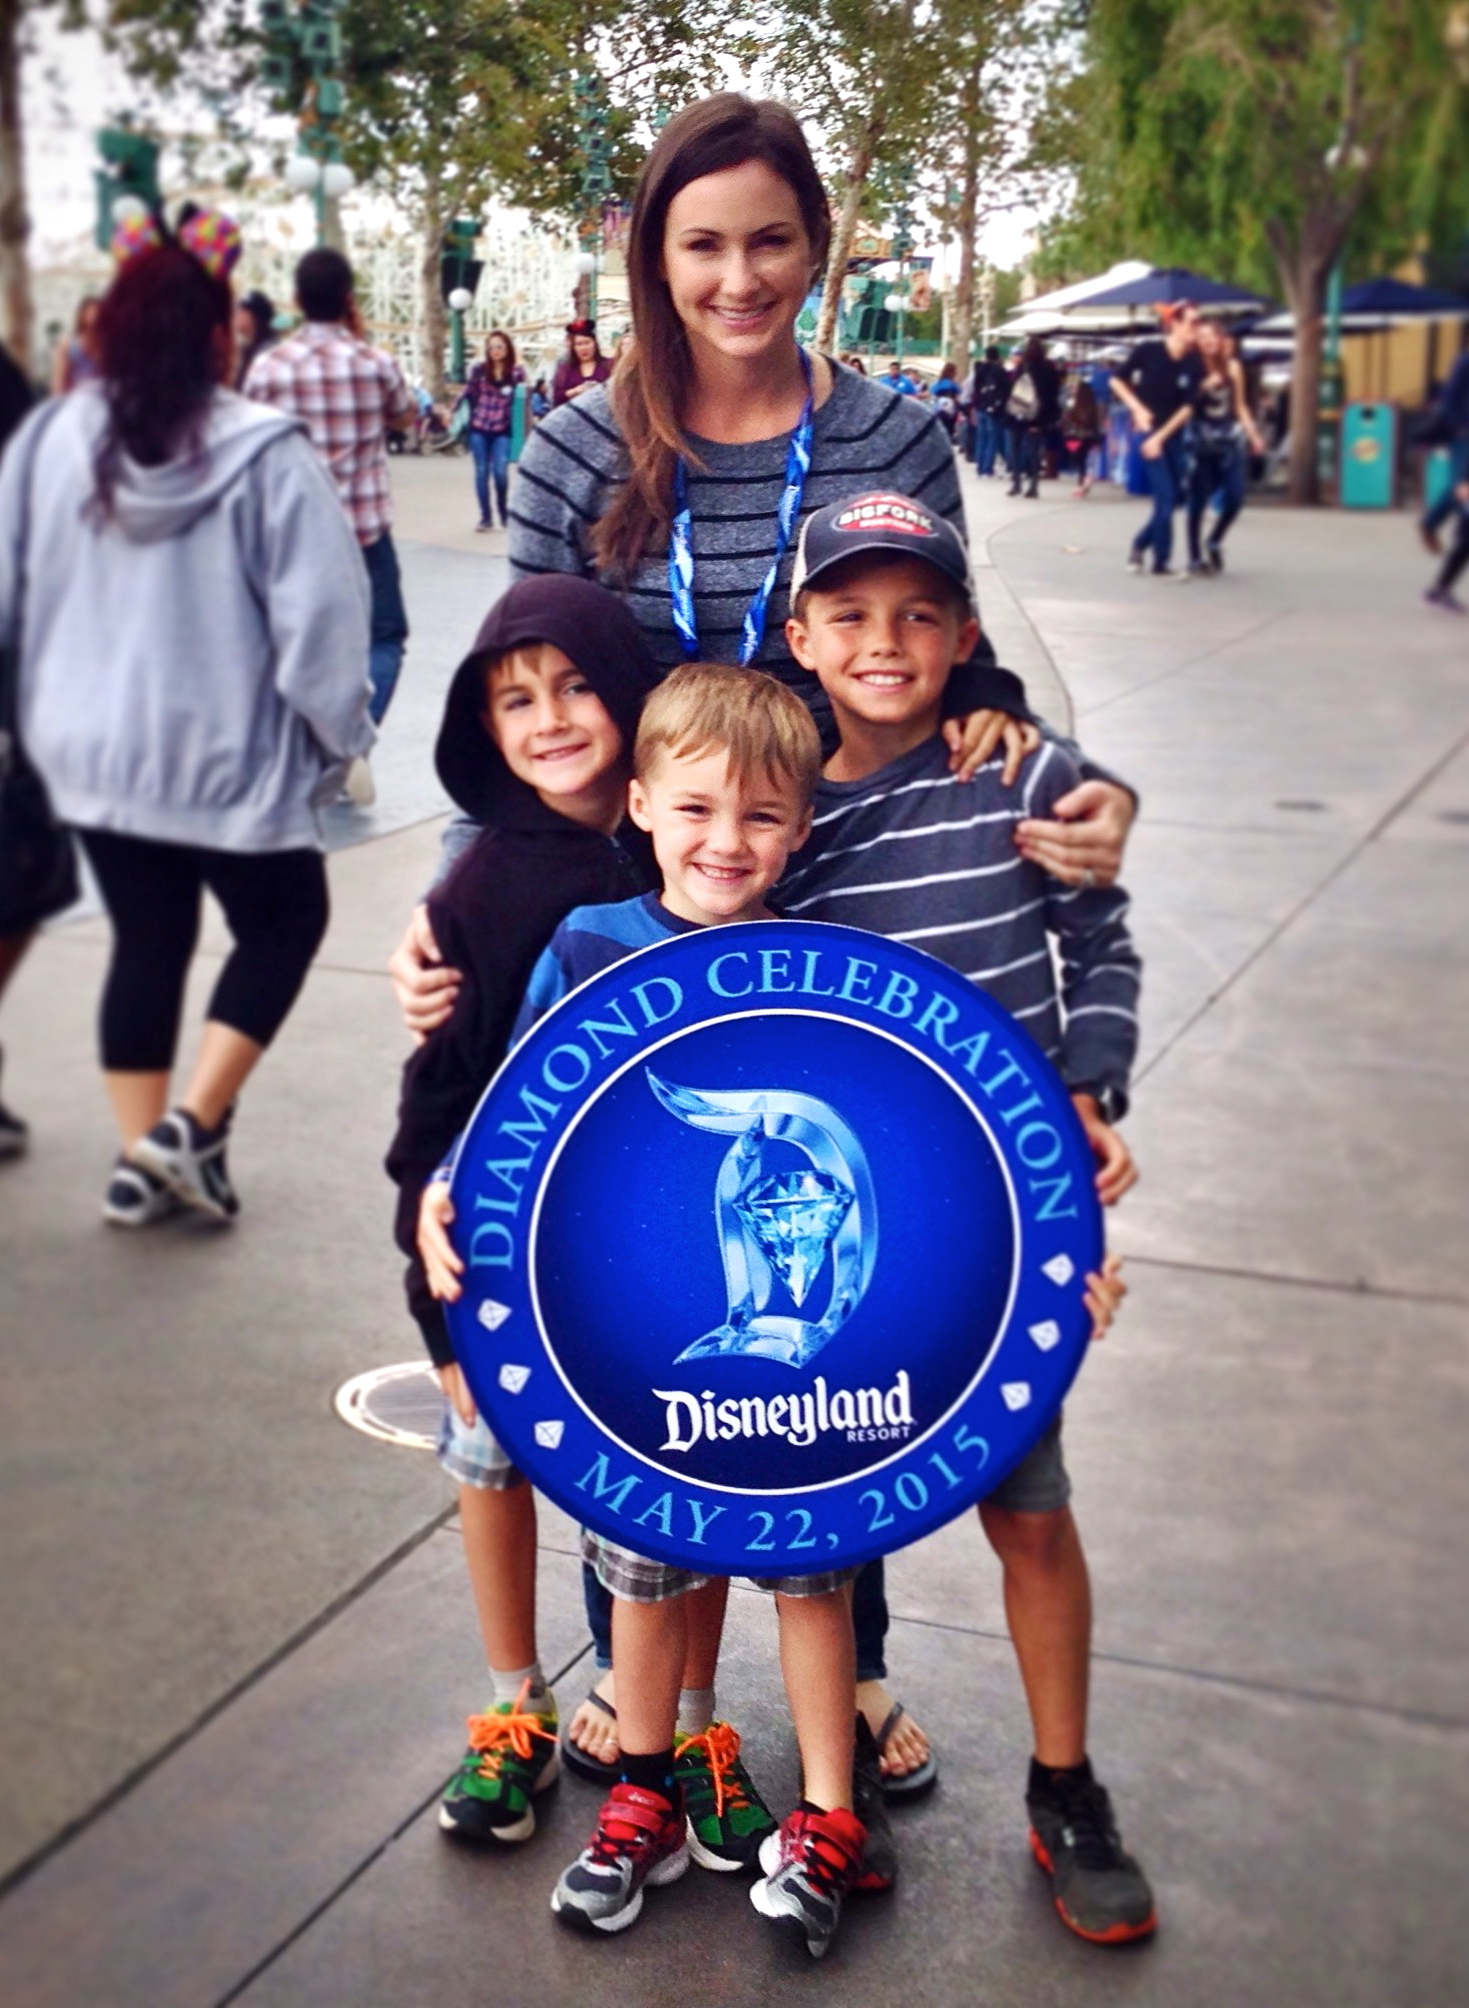 Disneyland's Diamond Celebration: What's new for kids